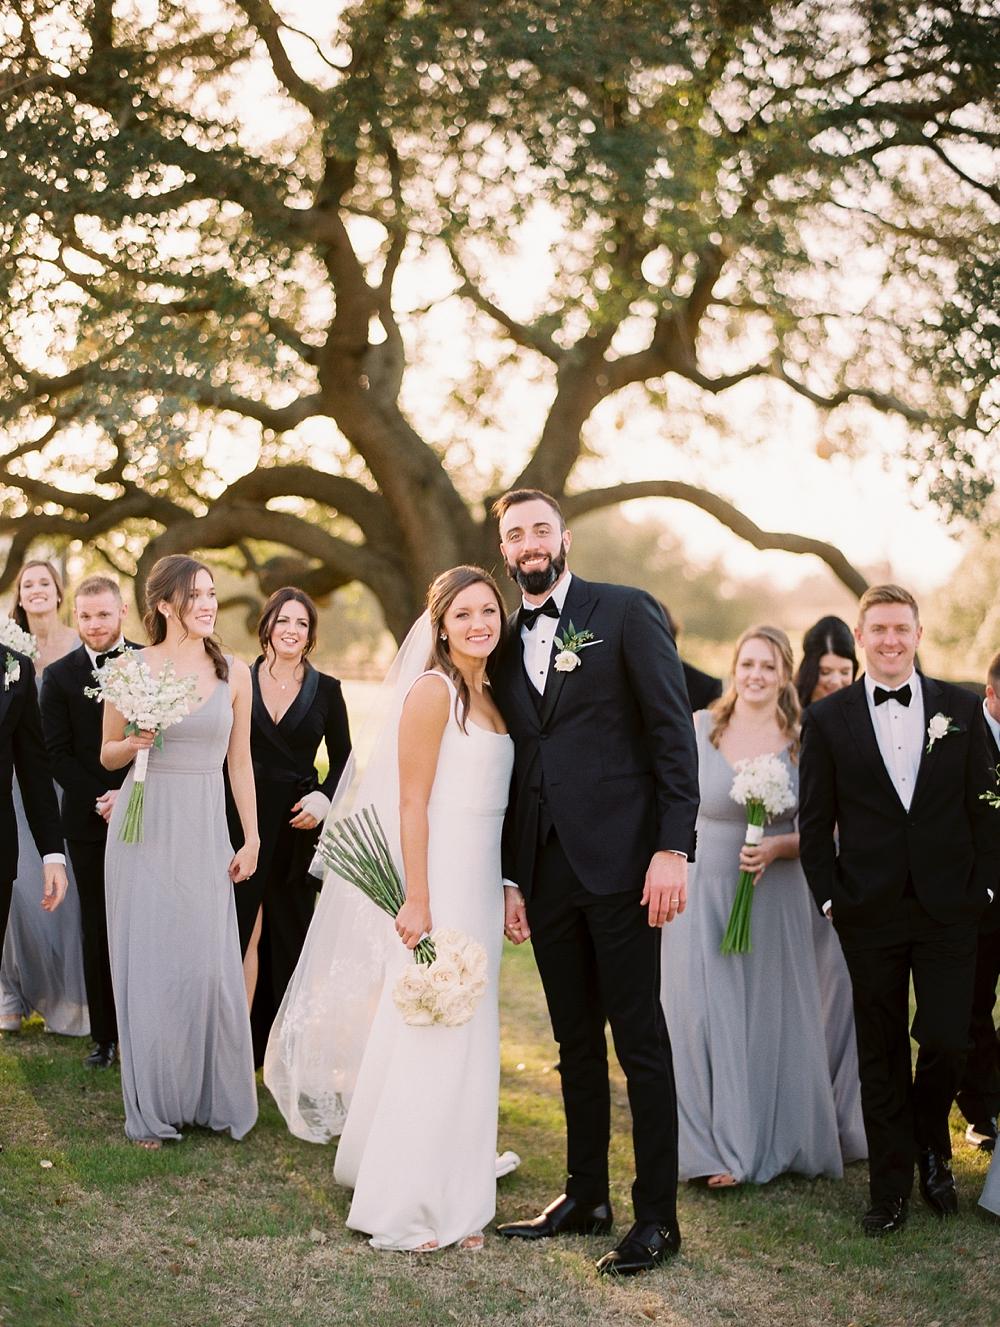 Kristin-La-Voie-Photography-austin-houston-texas-wedding-photographer-the-oaks-at-high-hill -197